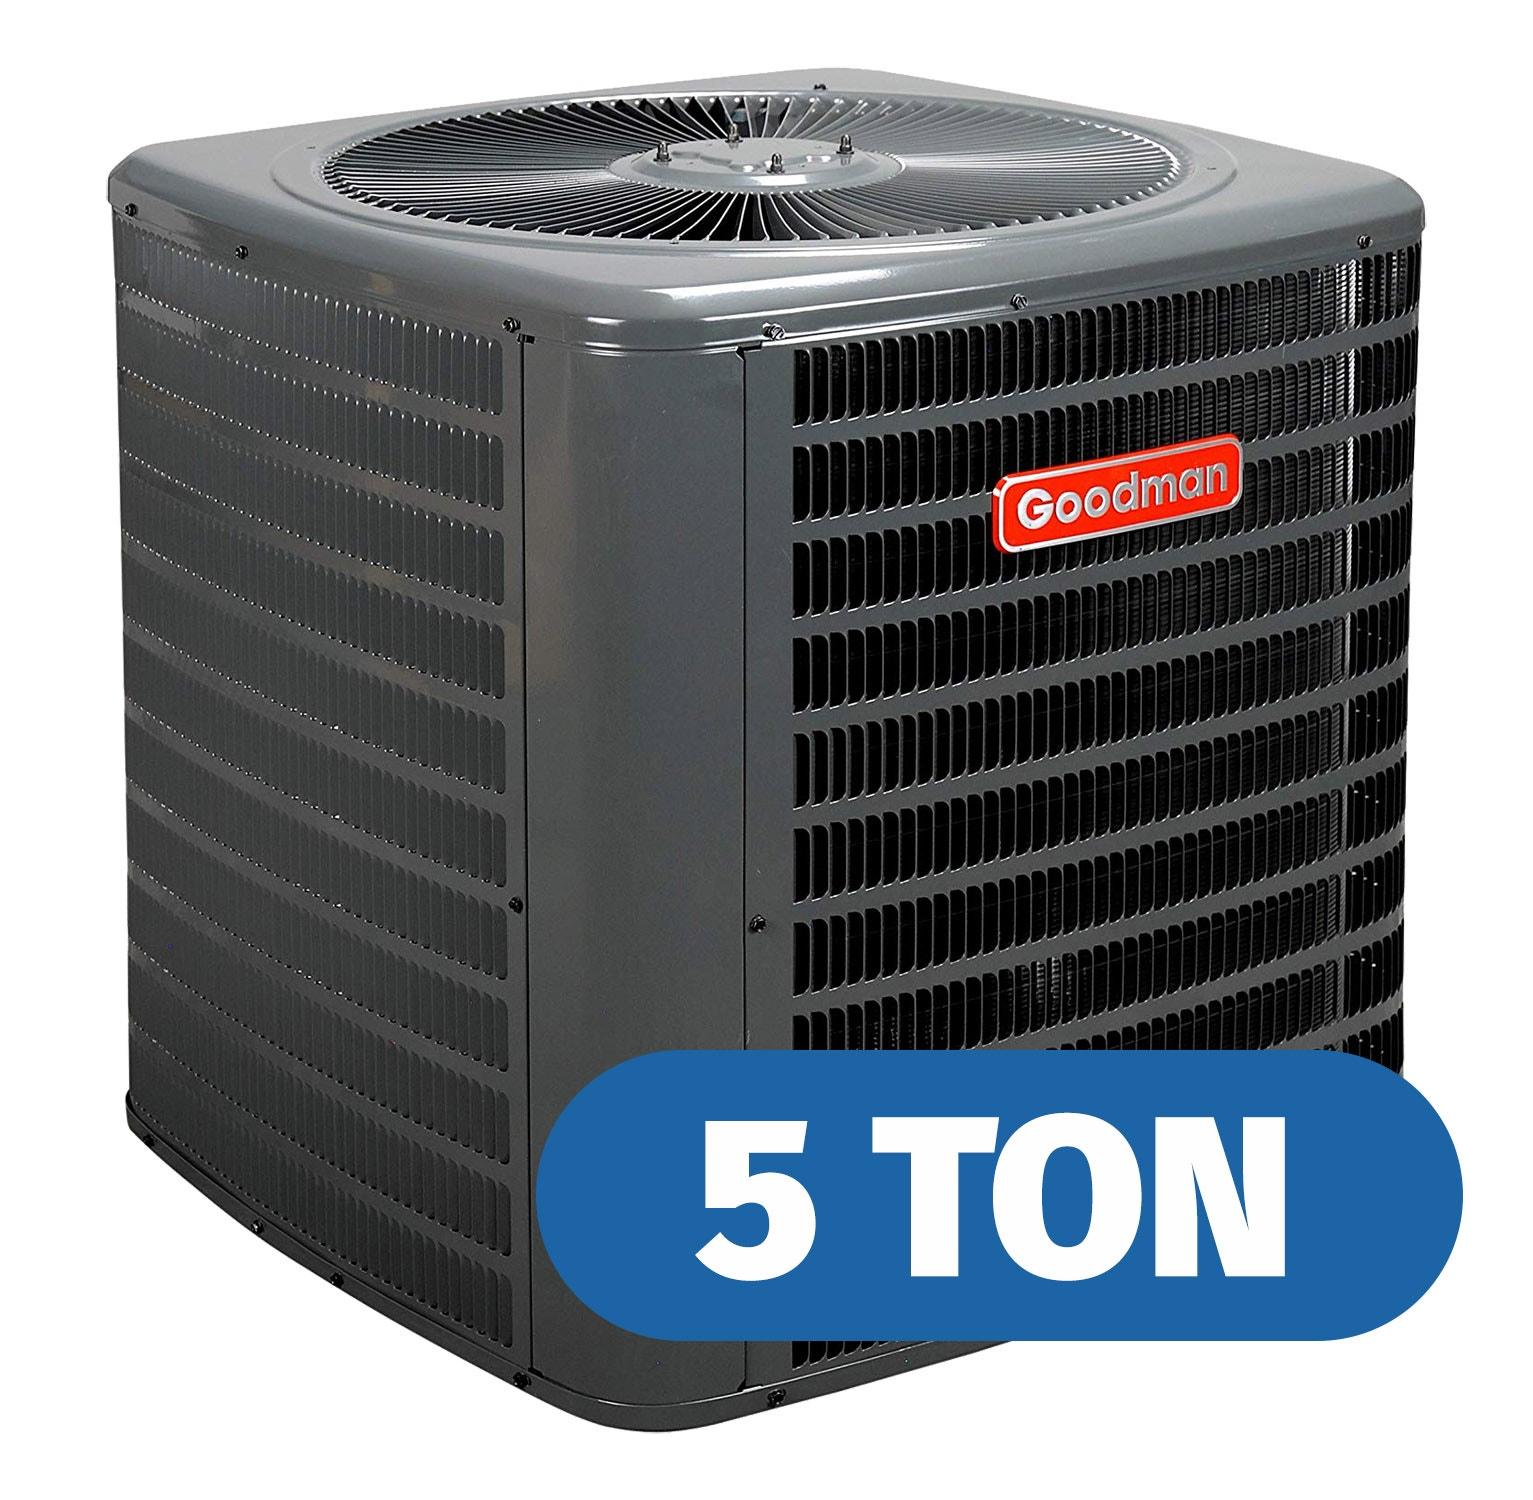 Goodman 5 Ton Heat Pumps